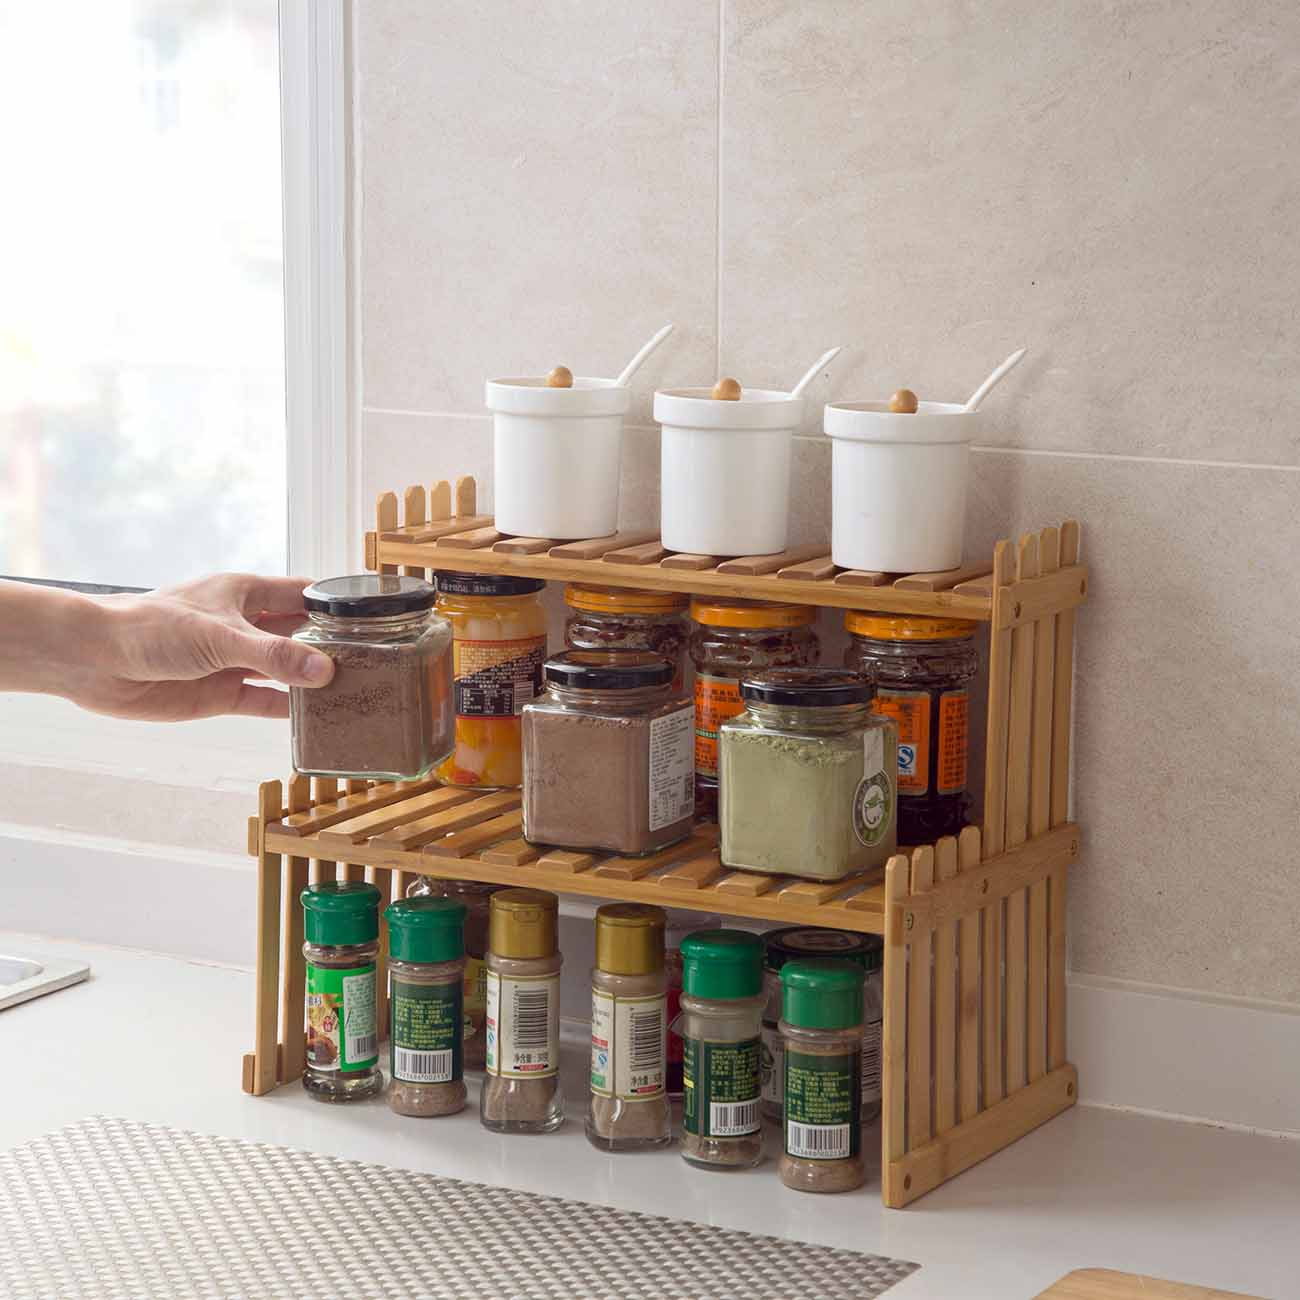 2 Layers Bamboo Storage Rack Kitchen Spice Jar Bottle Seasoning Rack Decoration Organizer Shelf Home Desktop Racks